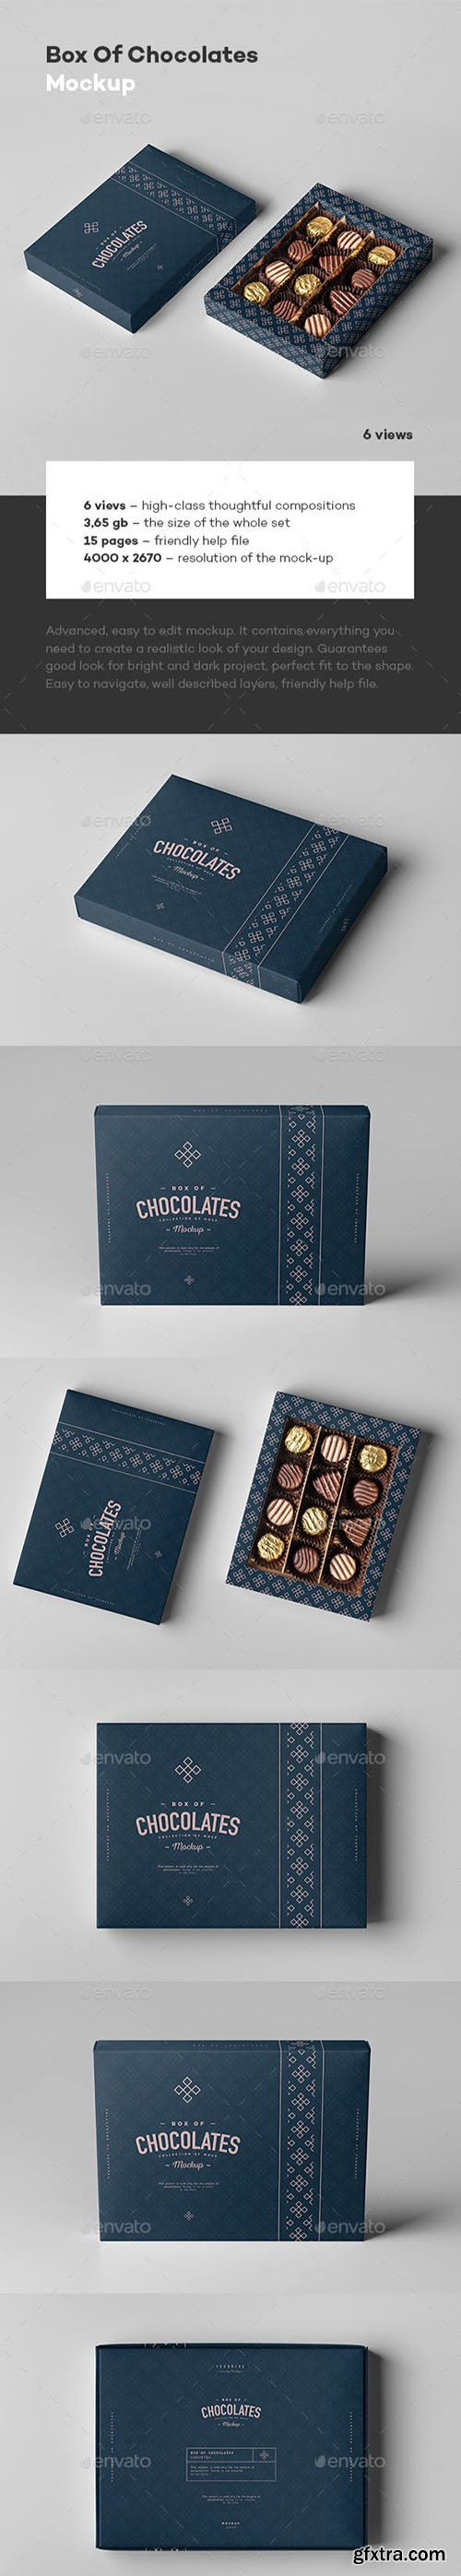 Box Of Chocolates Mock-up 23126932